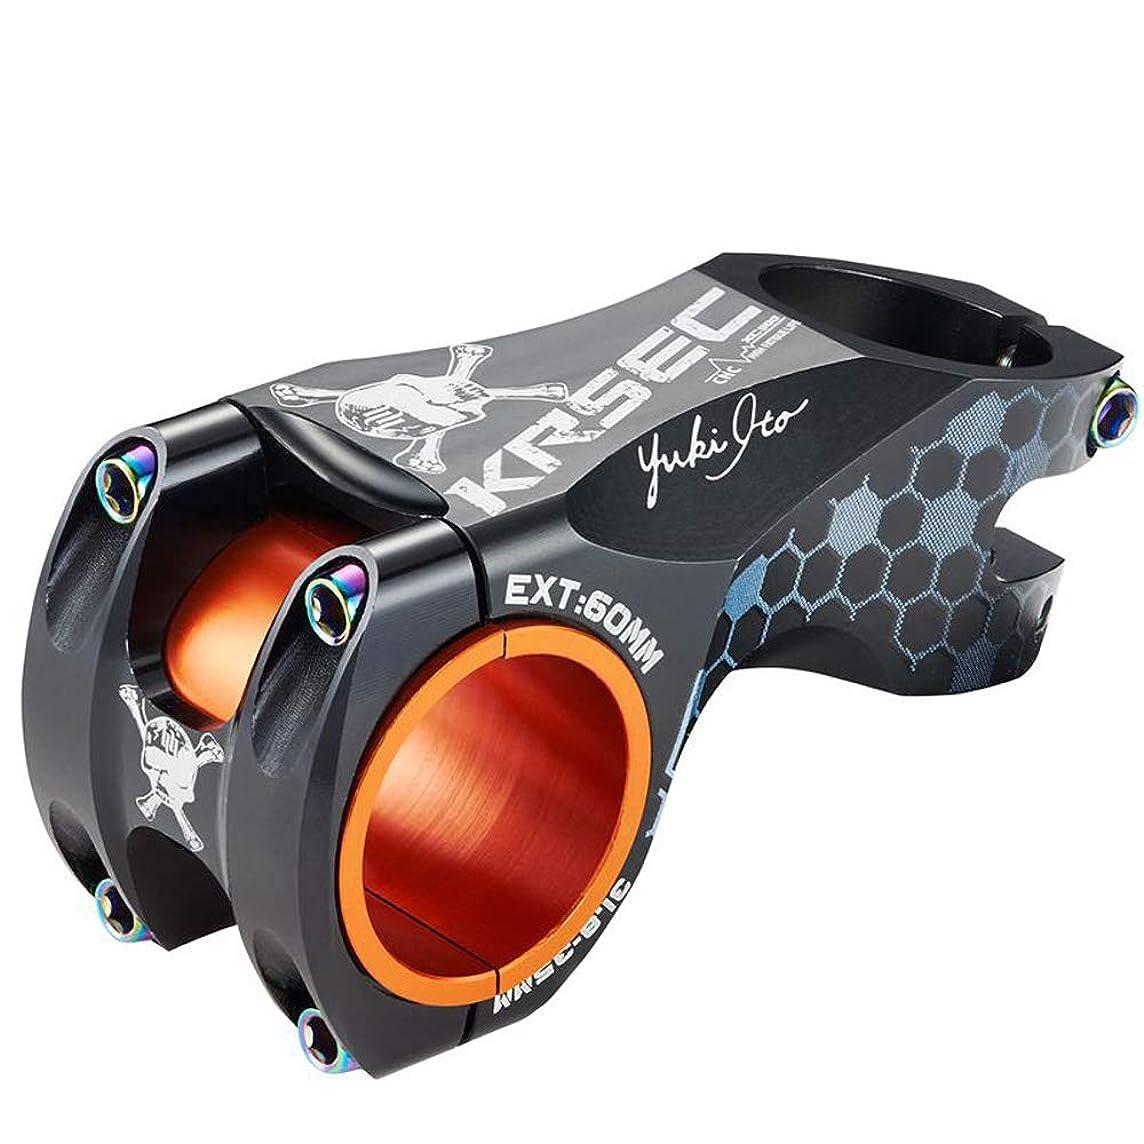 KRSCT Bike Bicycle Stem 31.8 × 60mm Lightweight Mountain Bike Stem Handlebar Stem Suitable for BMX MTB Road Bike, Aluminum Alloy, Adjustable